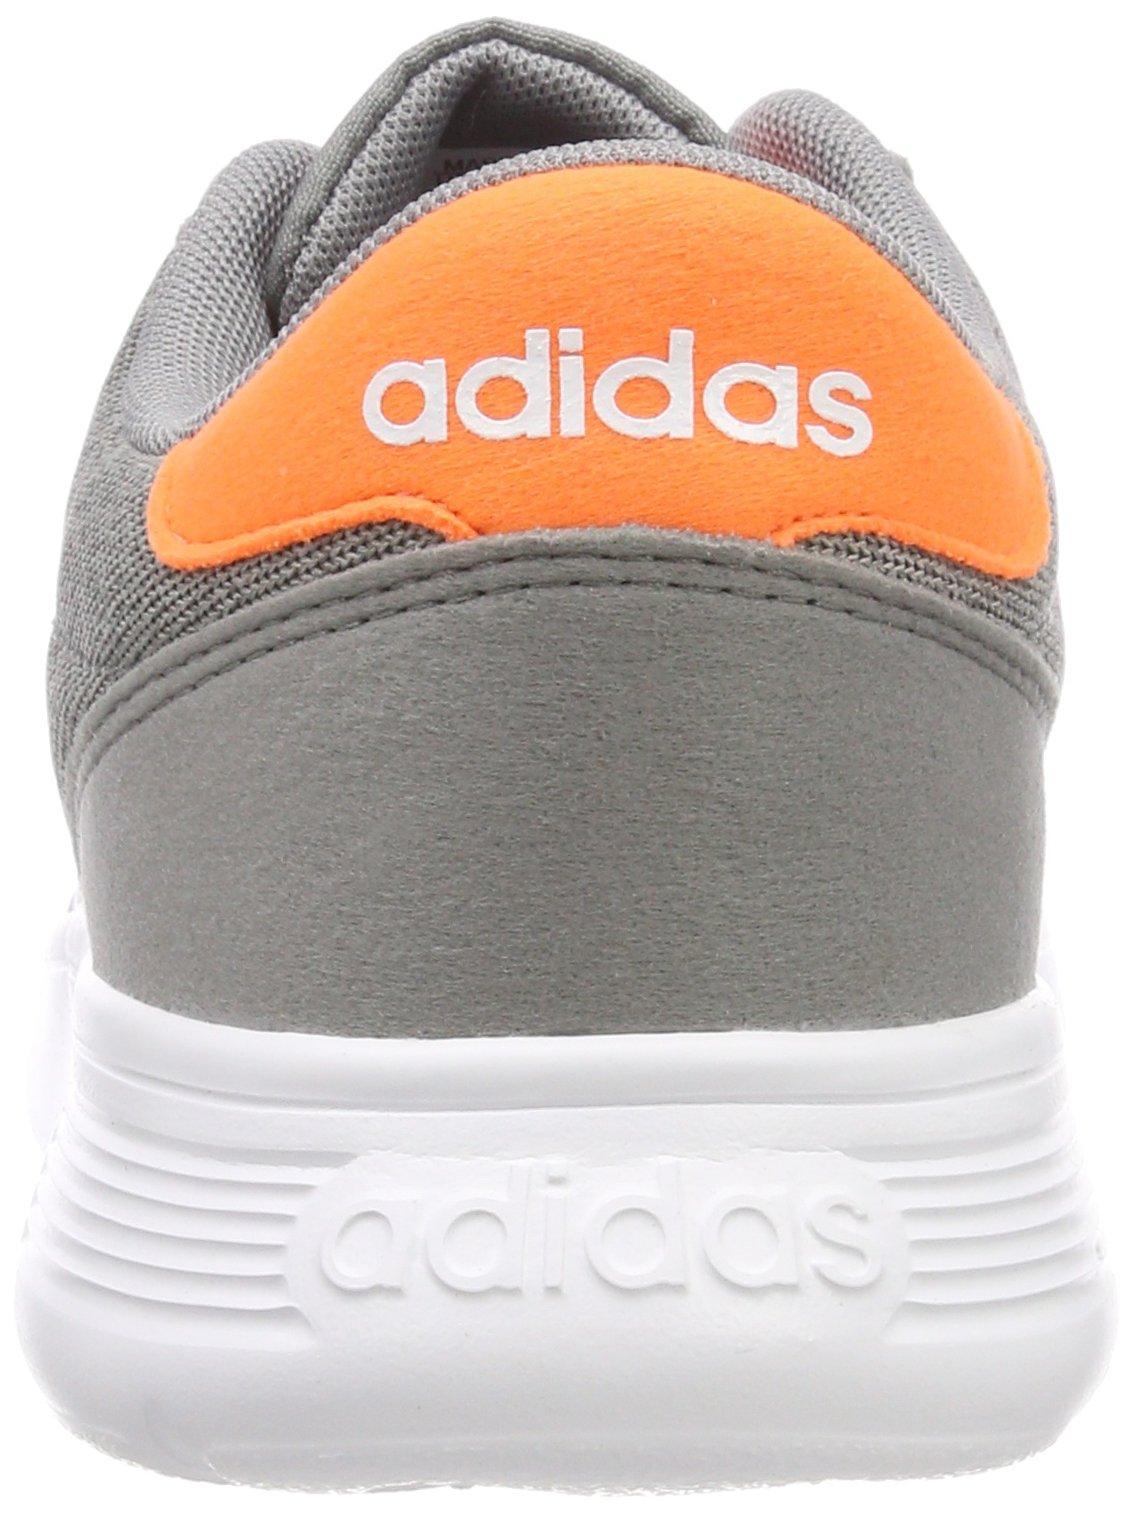 adidas Unisex Kids' Lite Racer Low-Top Sneakers